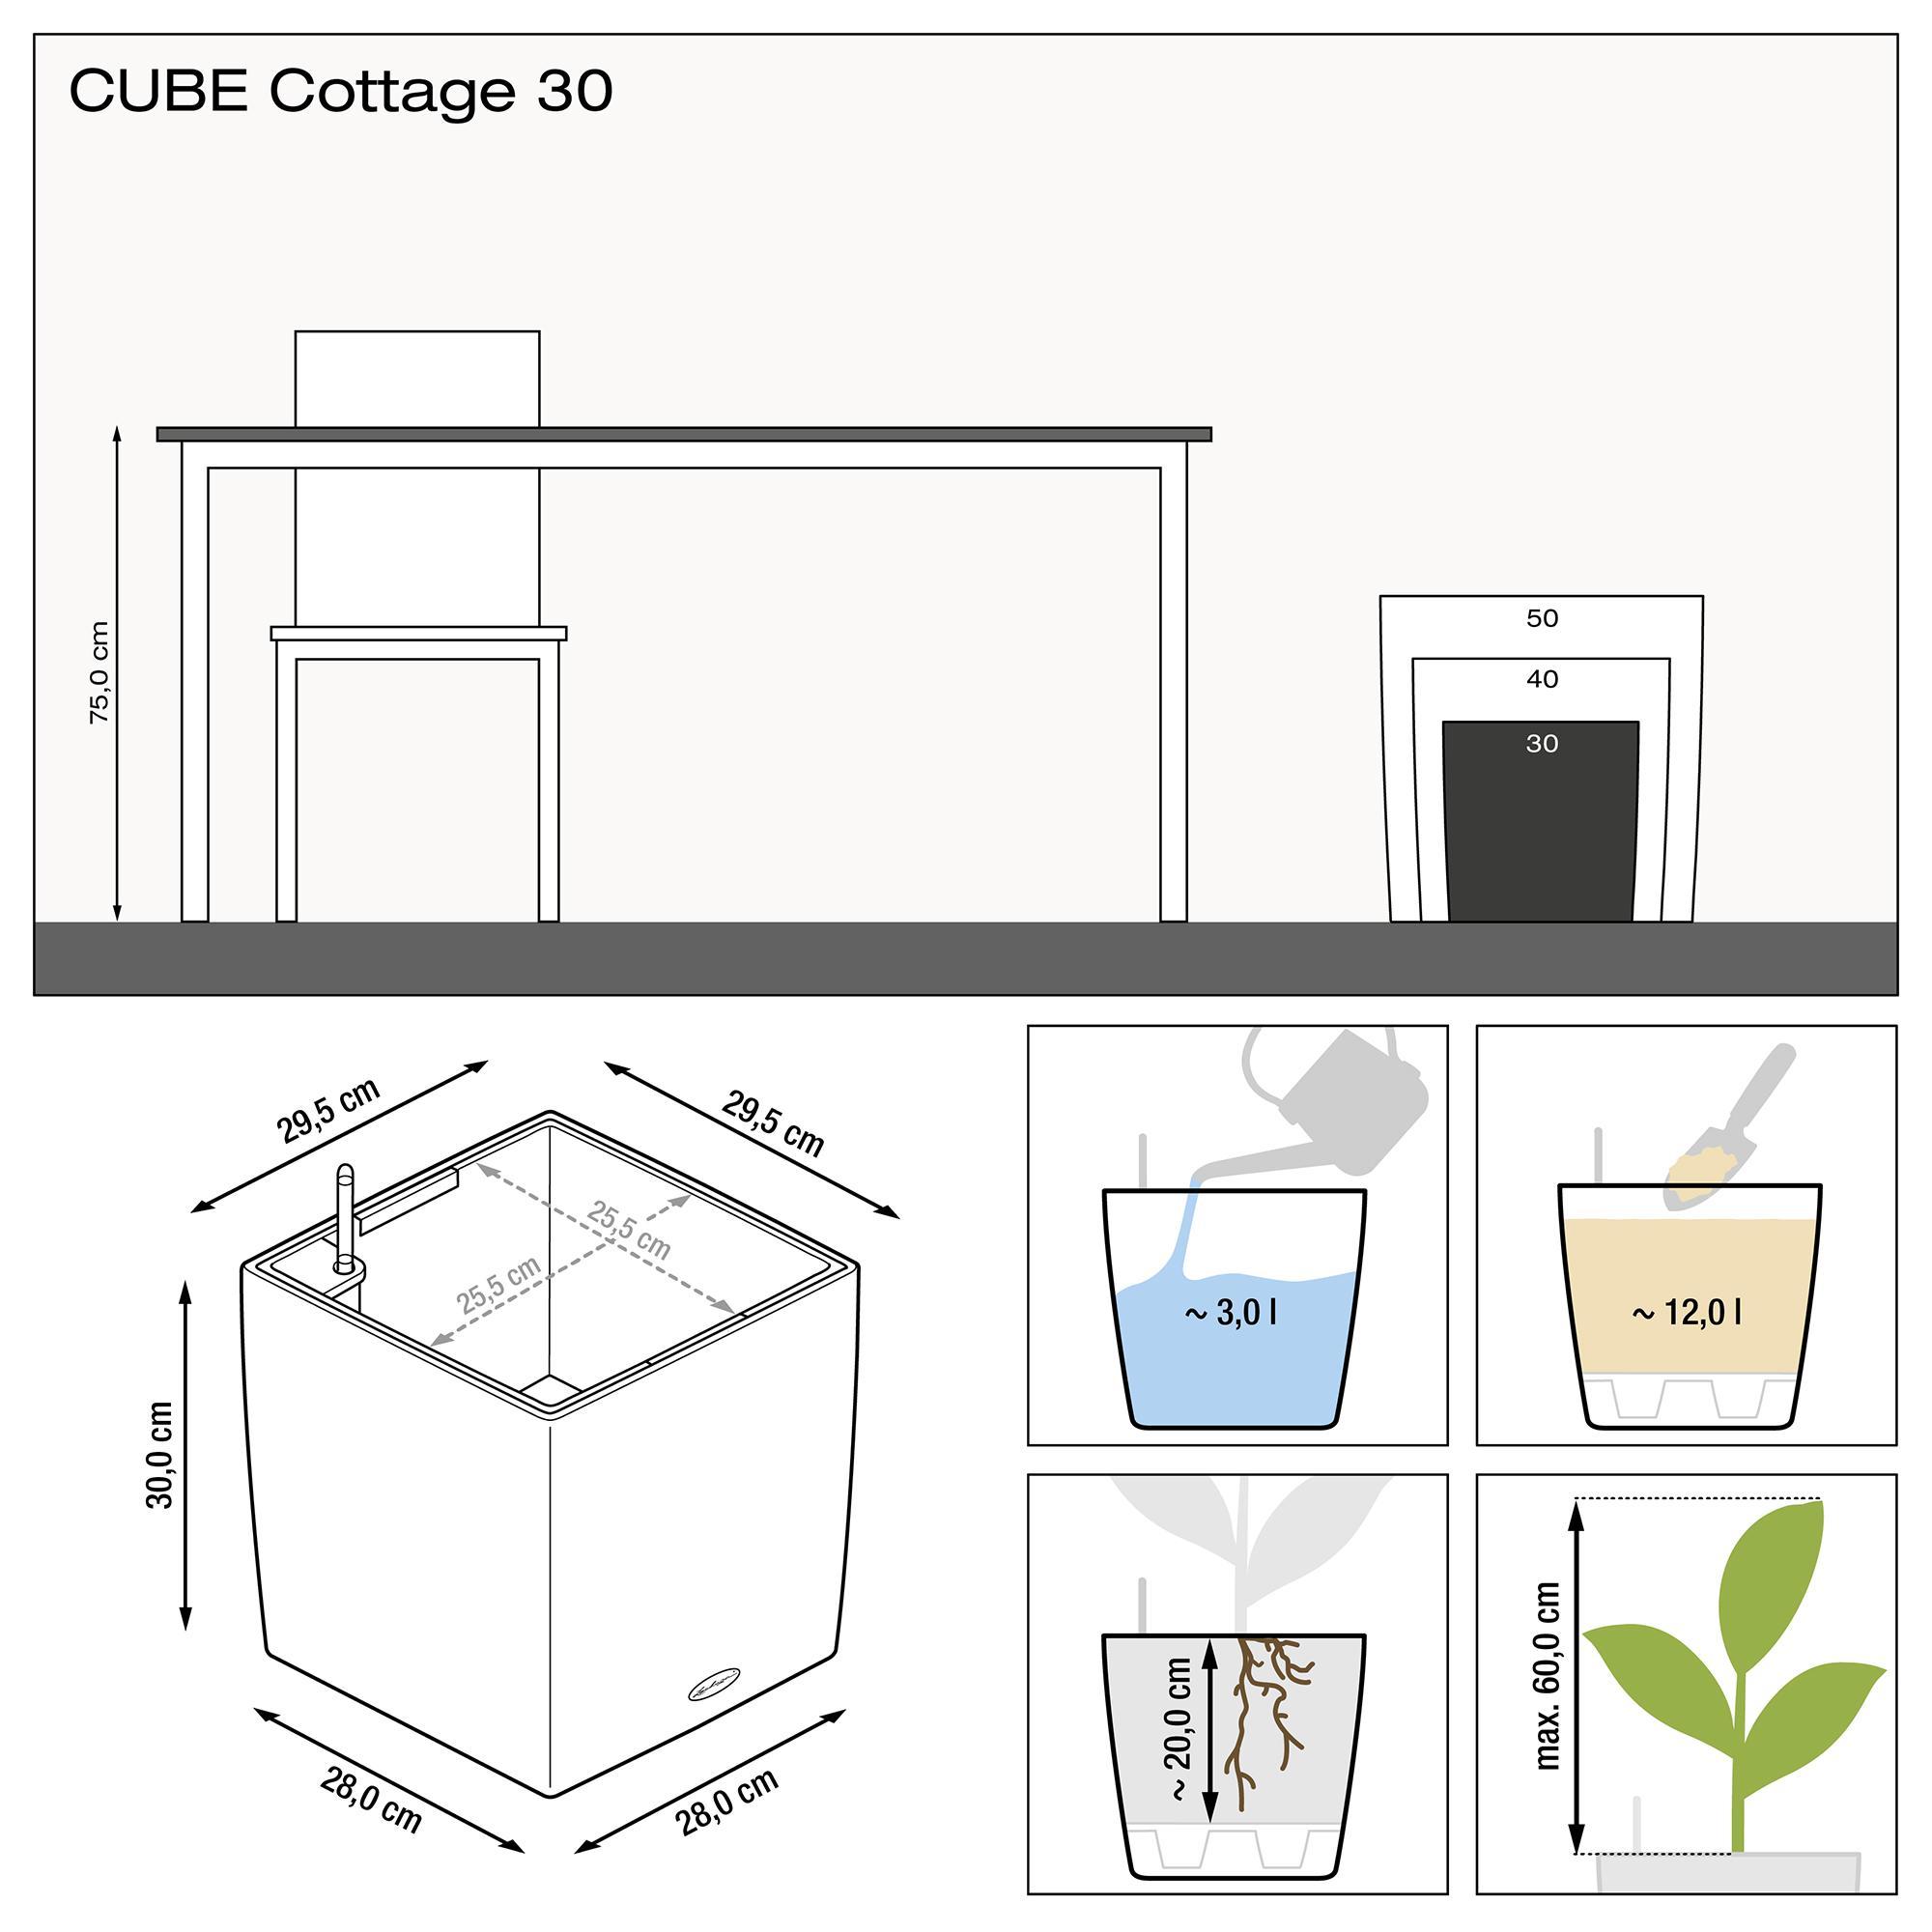 CUBE Cottage 30 mokka - Bild 3